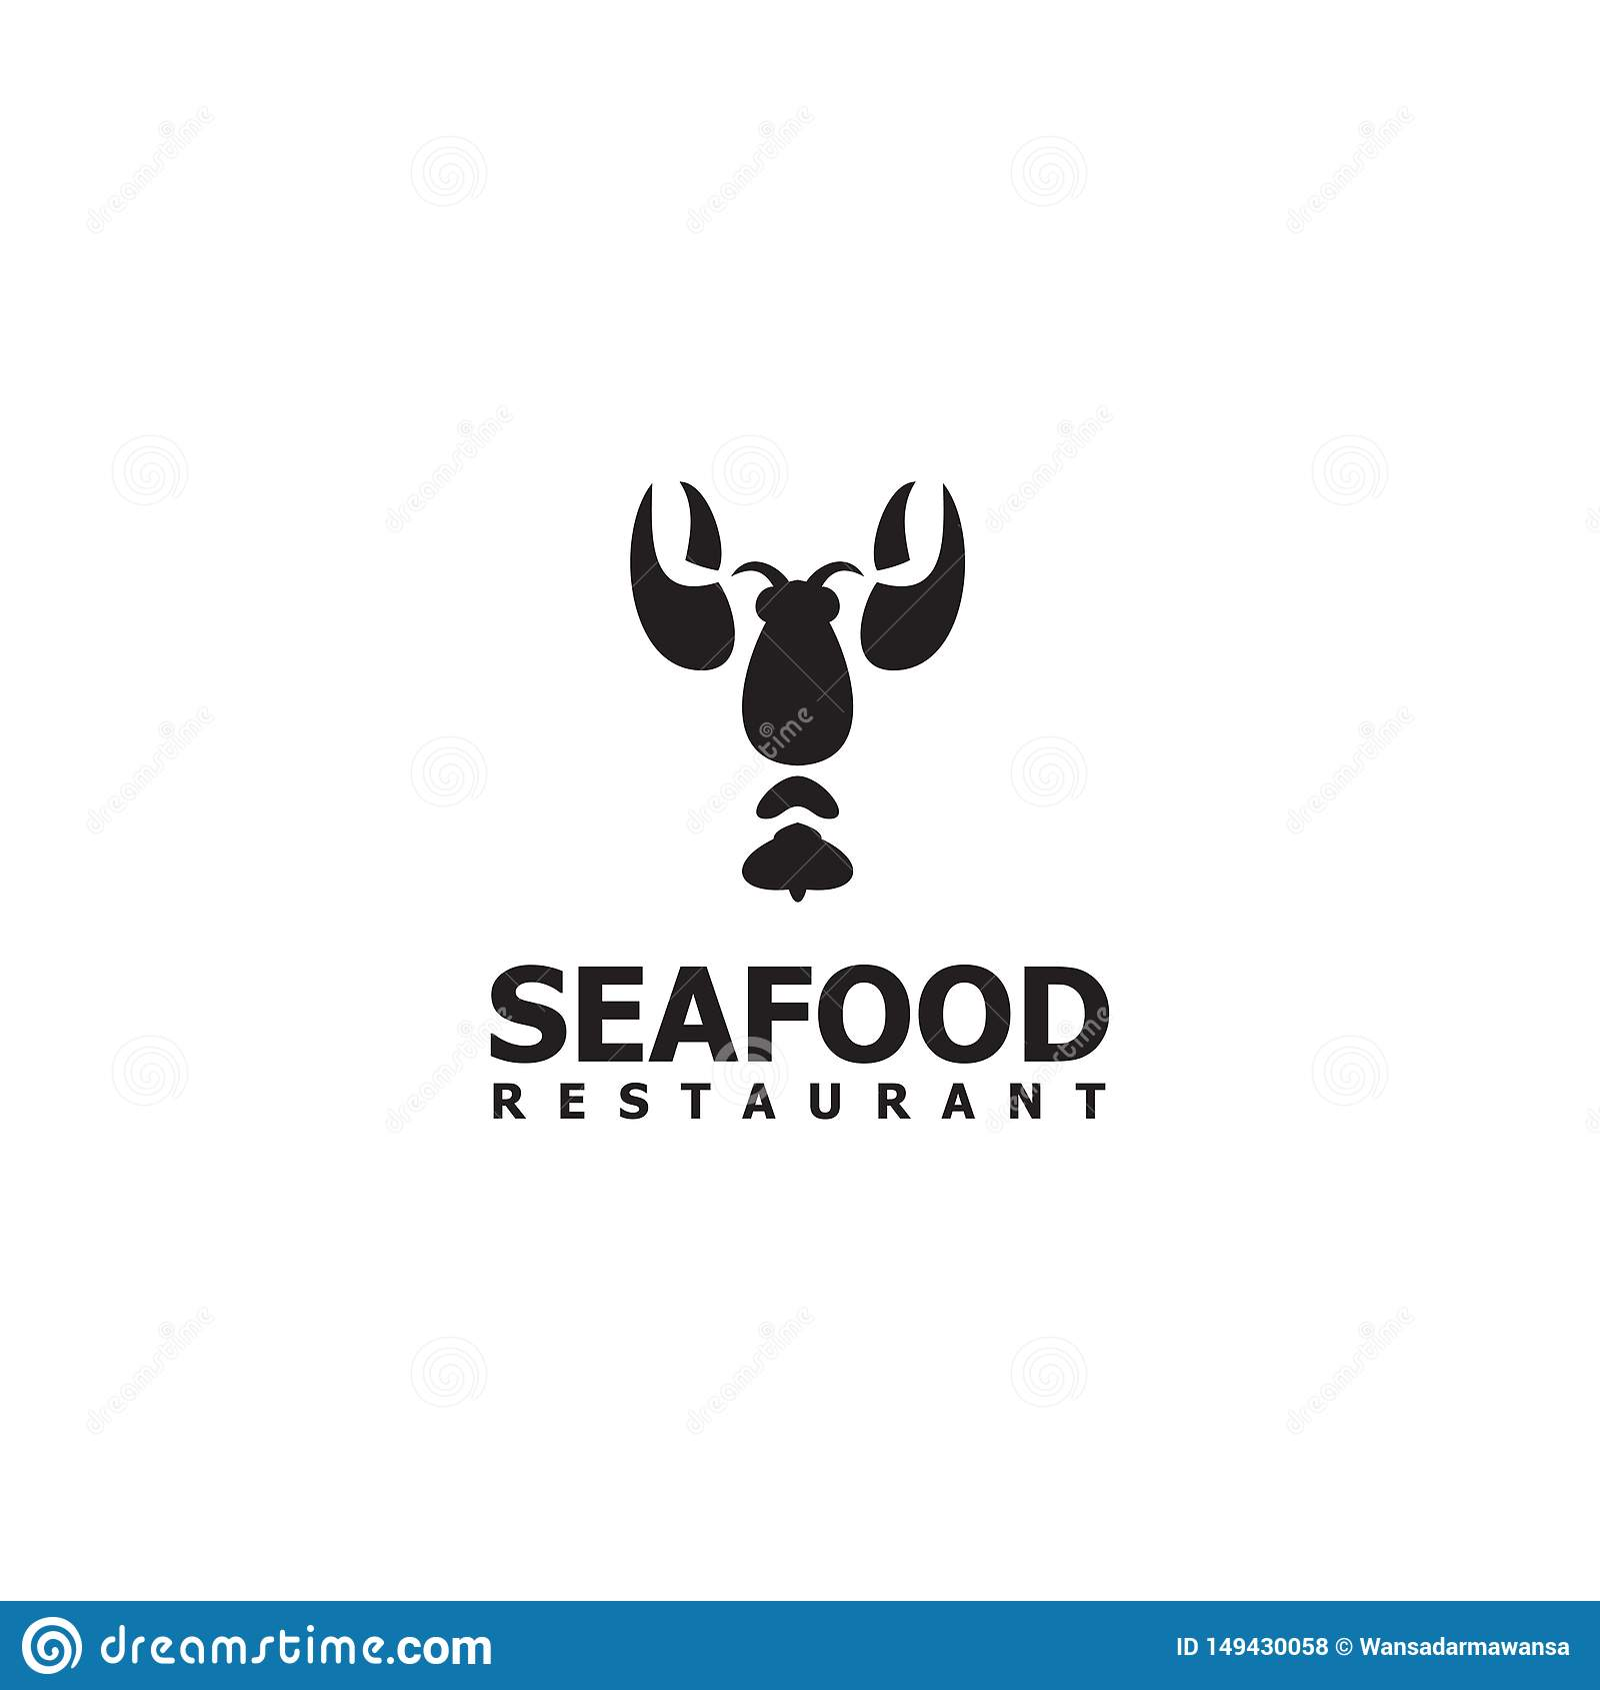 Seafood Restaurant Logo Design Vector Template Stock Vector Illustration Of Line Elegant 149430058